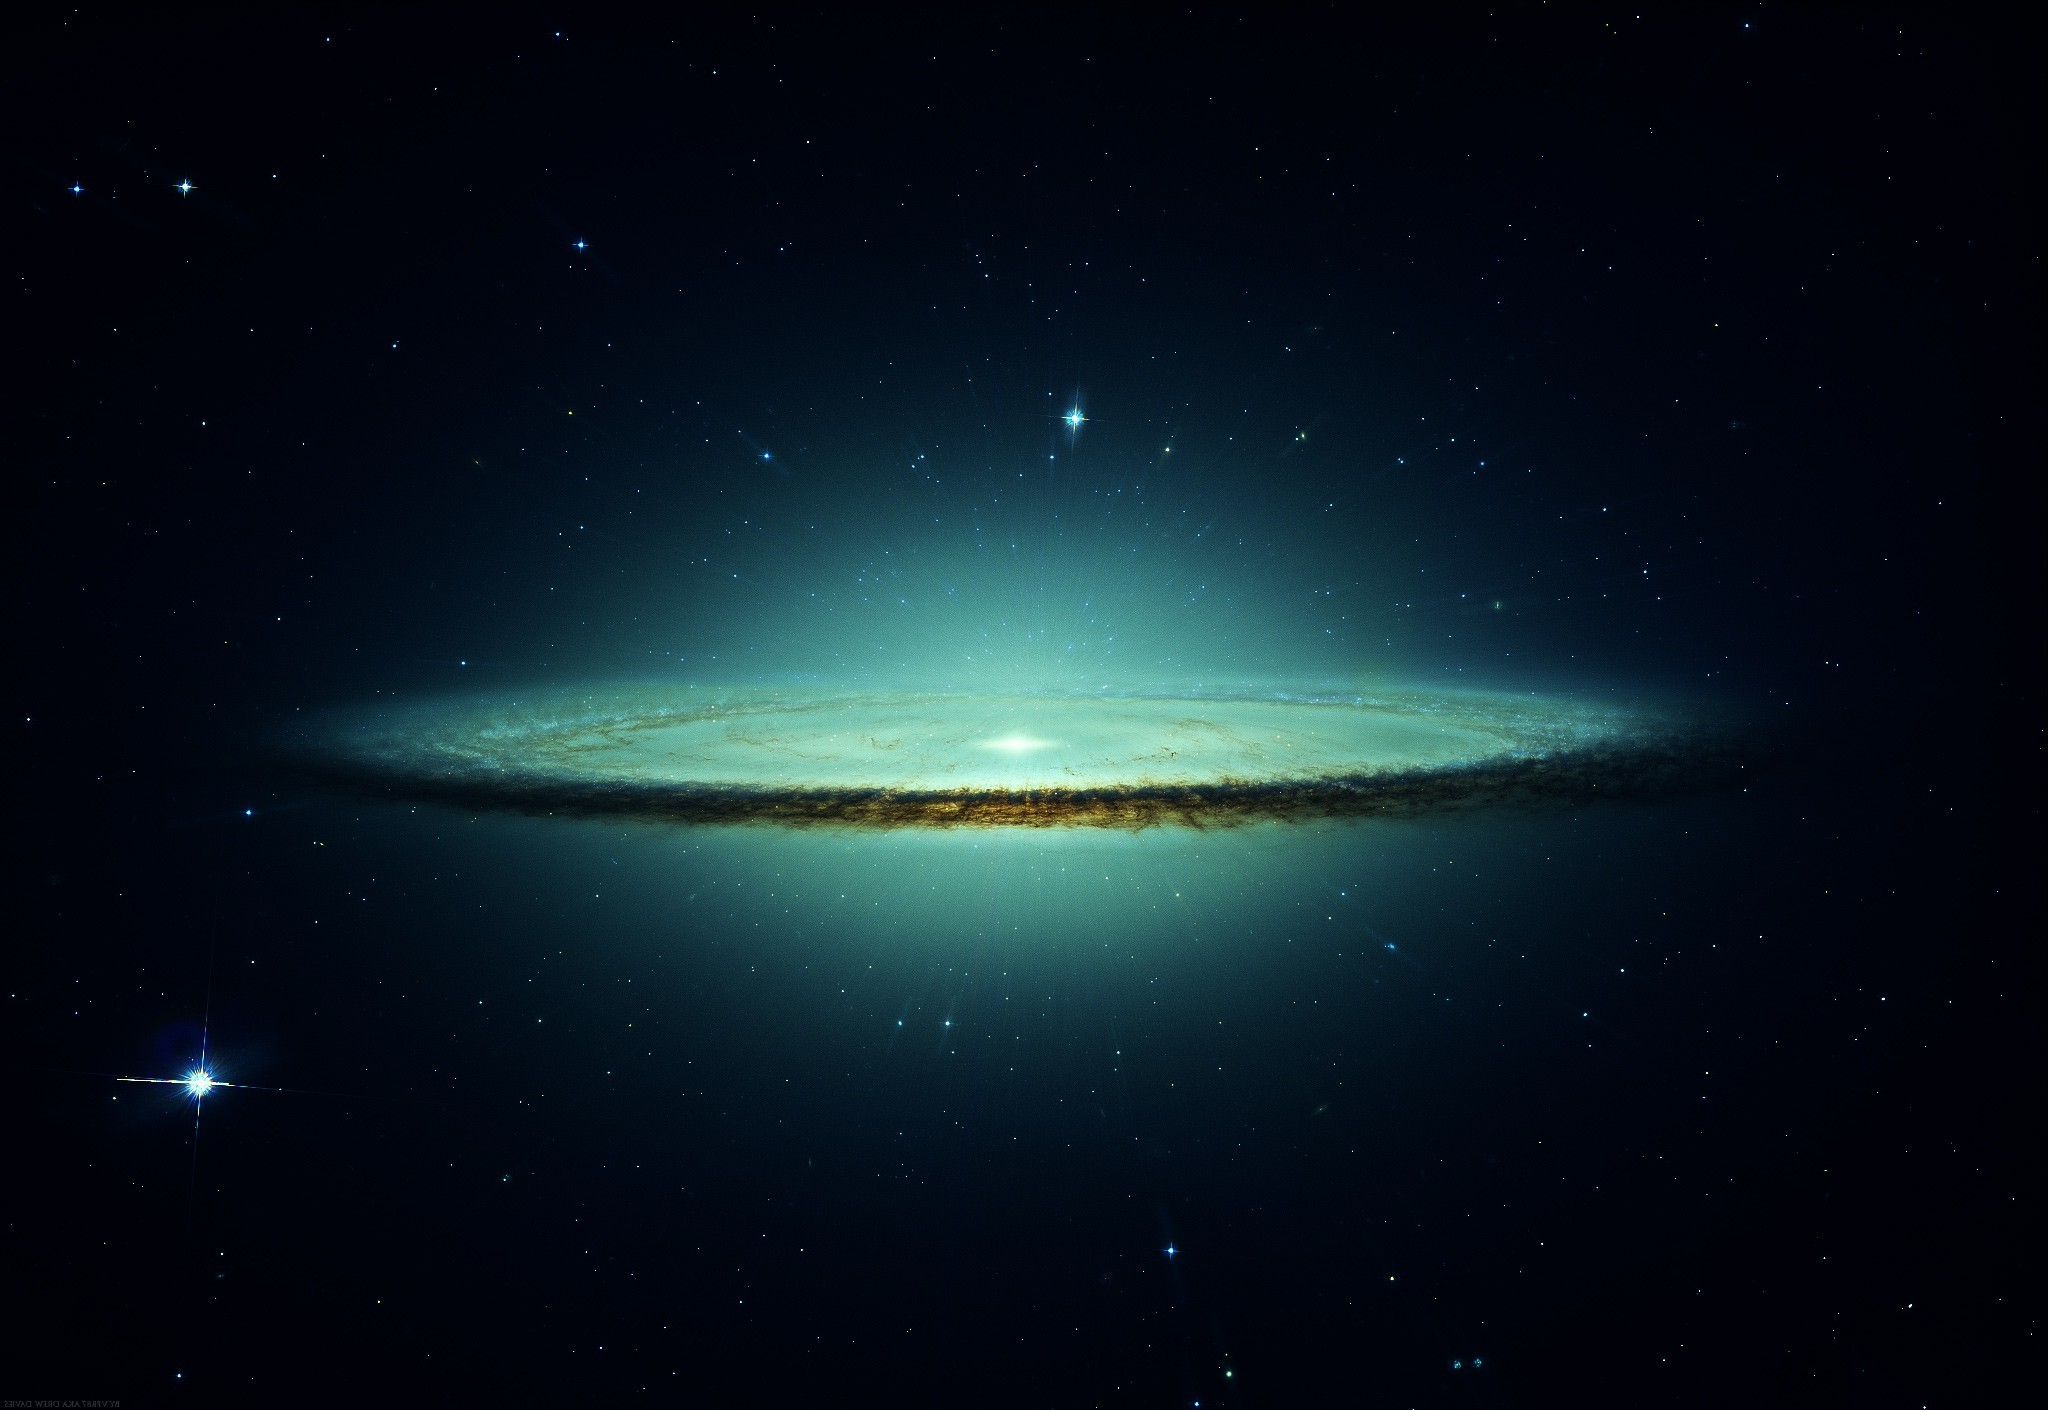 Galaxy, Sombrero Galaxy Wallpapers HD / Desktop and Mobile Backgrounds ·  cigar galaxy hi res …